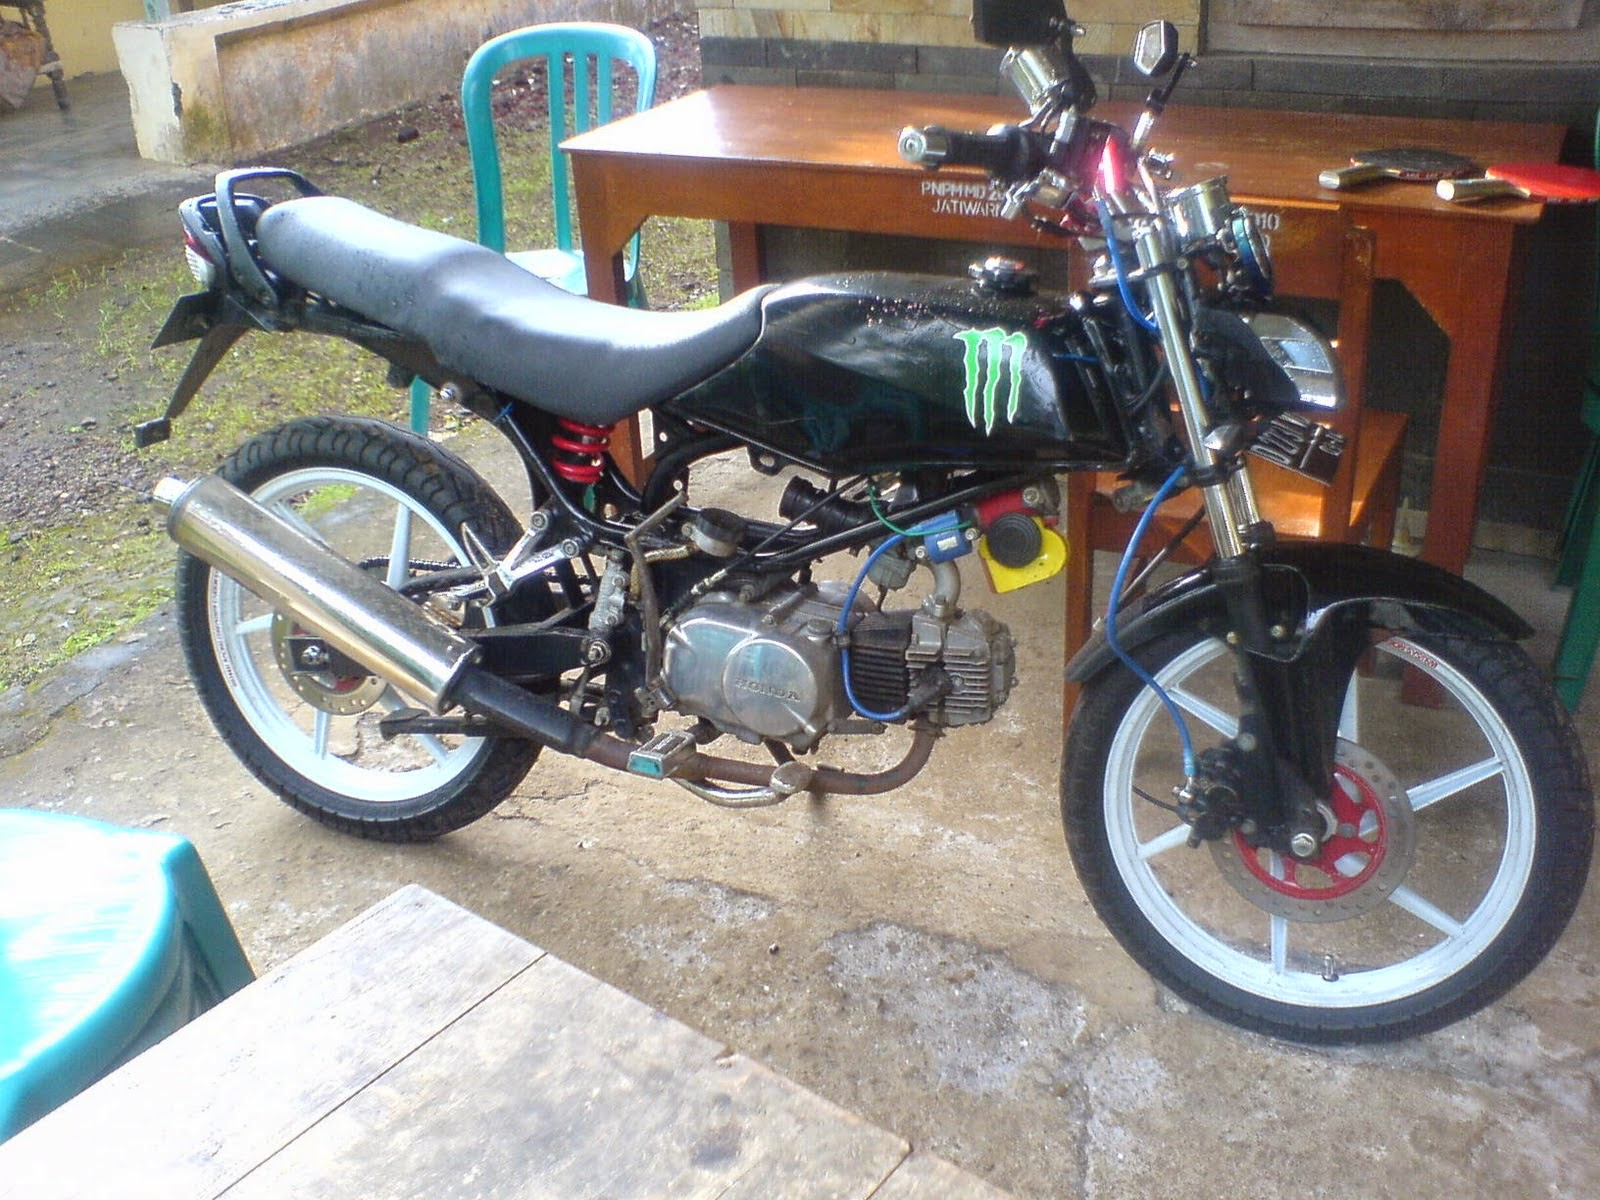 110 Modifikasi Motor Win 100 Jadi Cb Modifikasi Motor Honda CB Terbaru